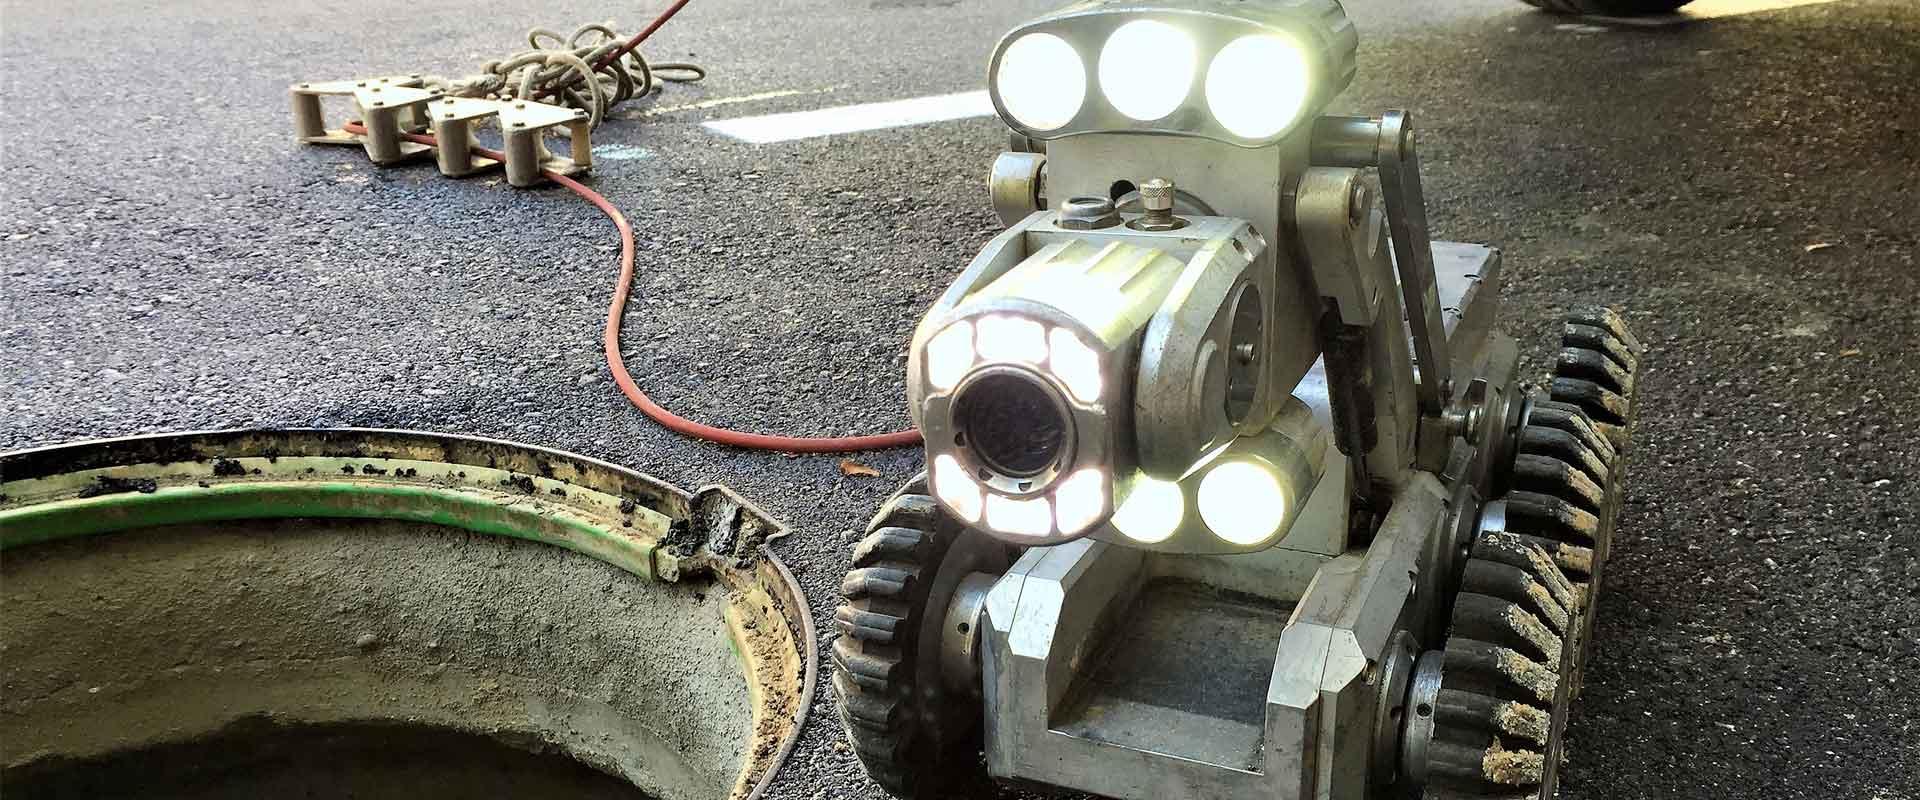 inspección de tuberías con cámaras TV en Madrid